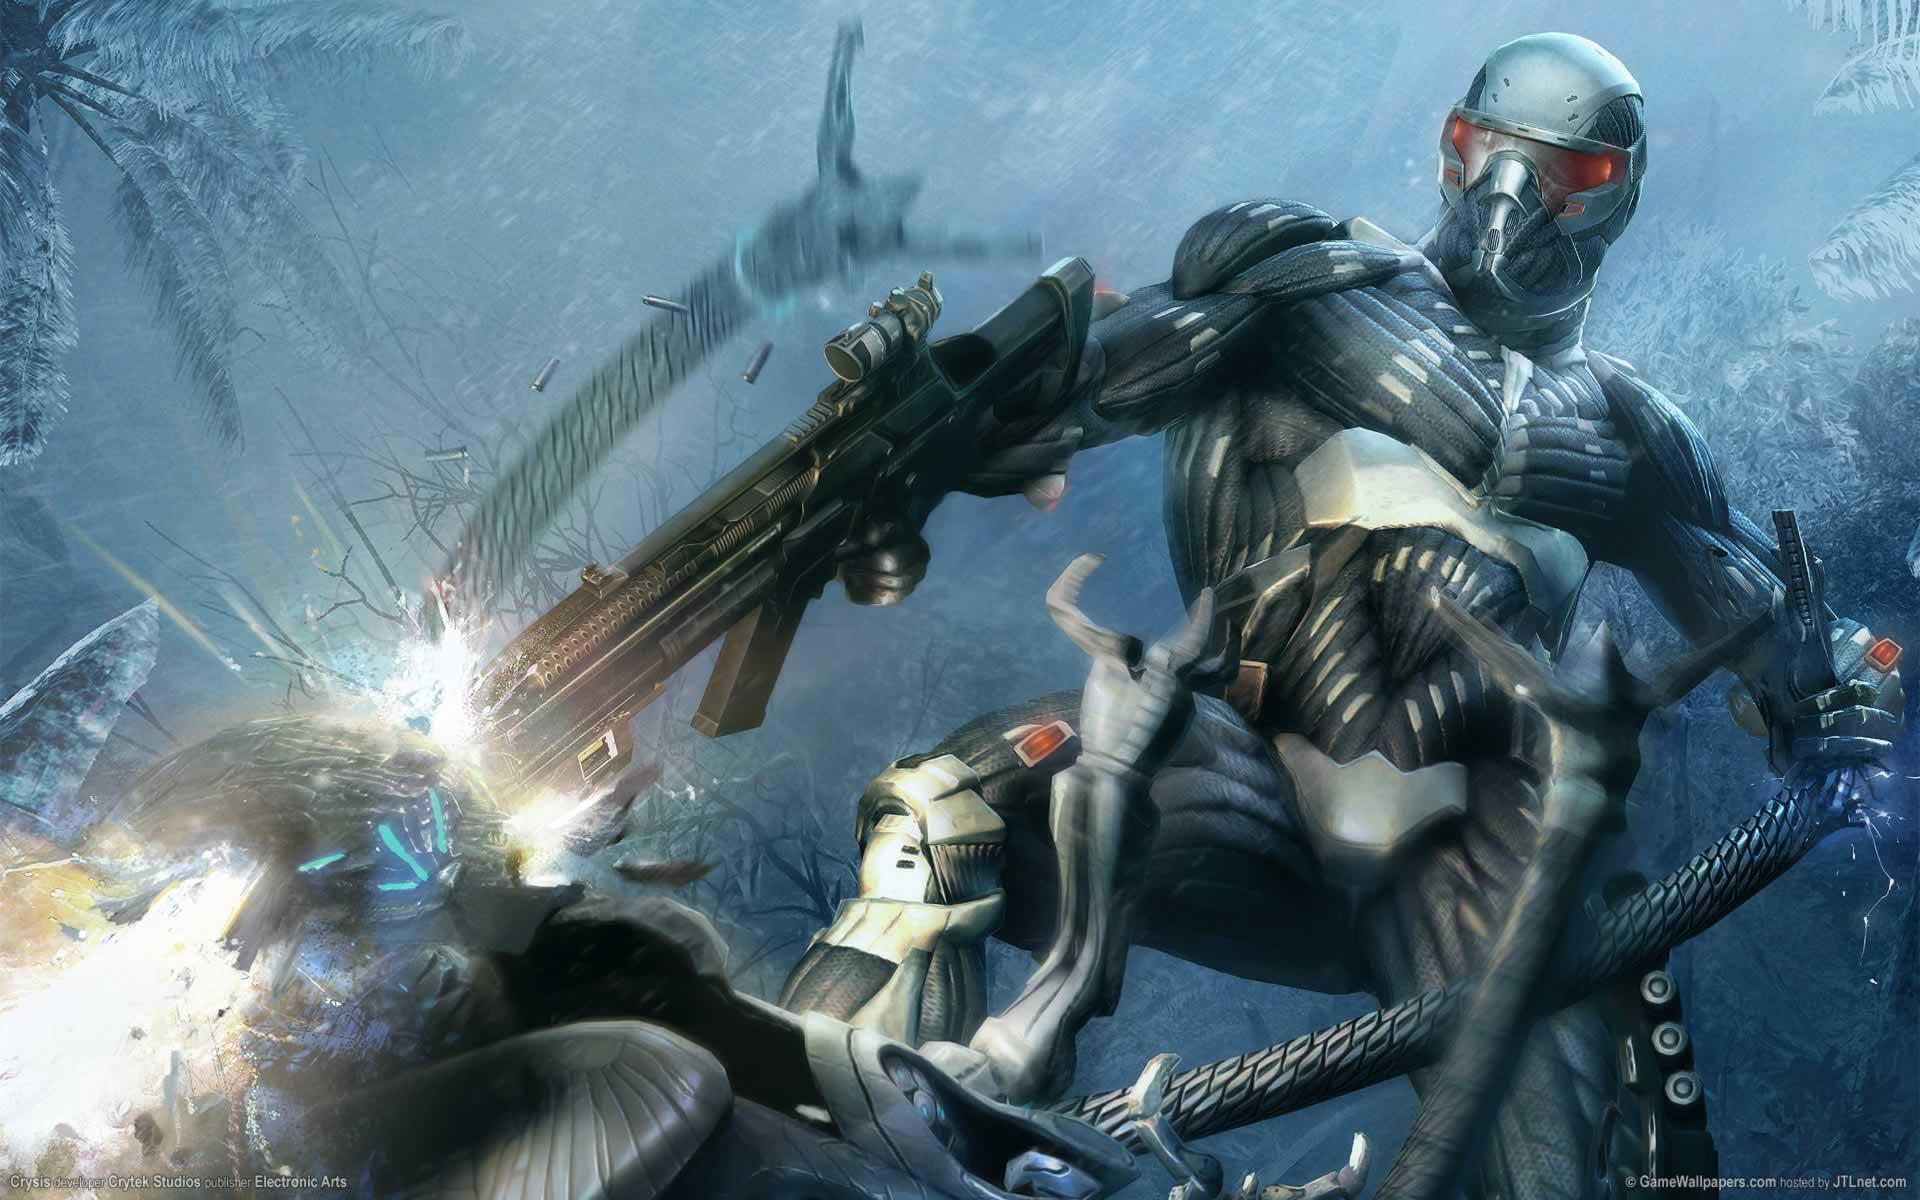 Crysis: juego de acción con realismo puro